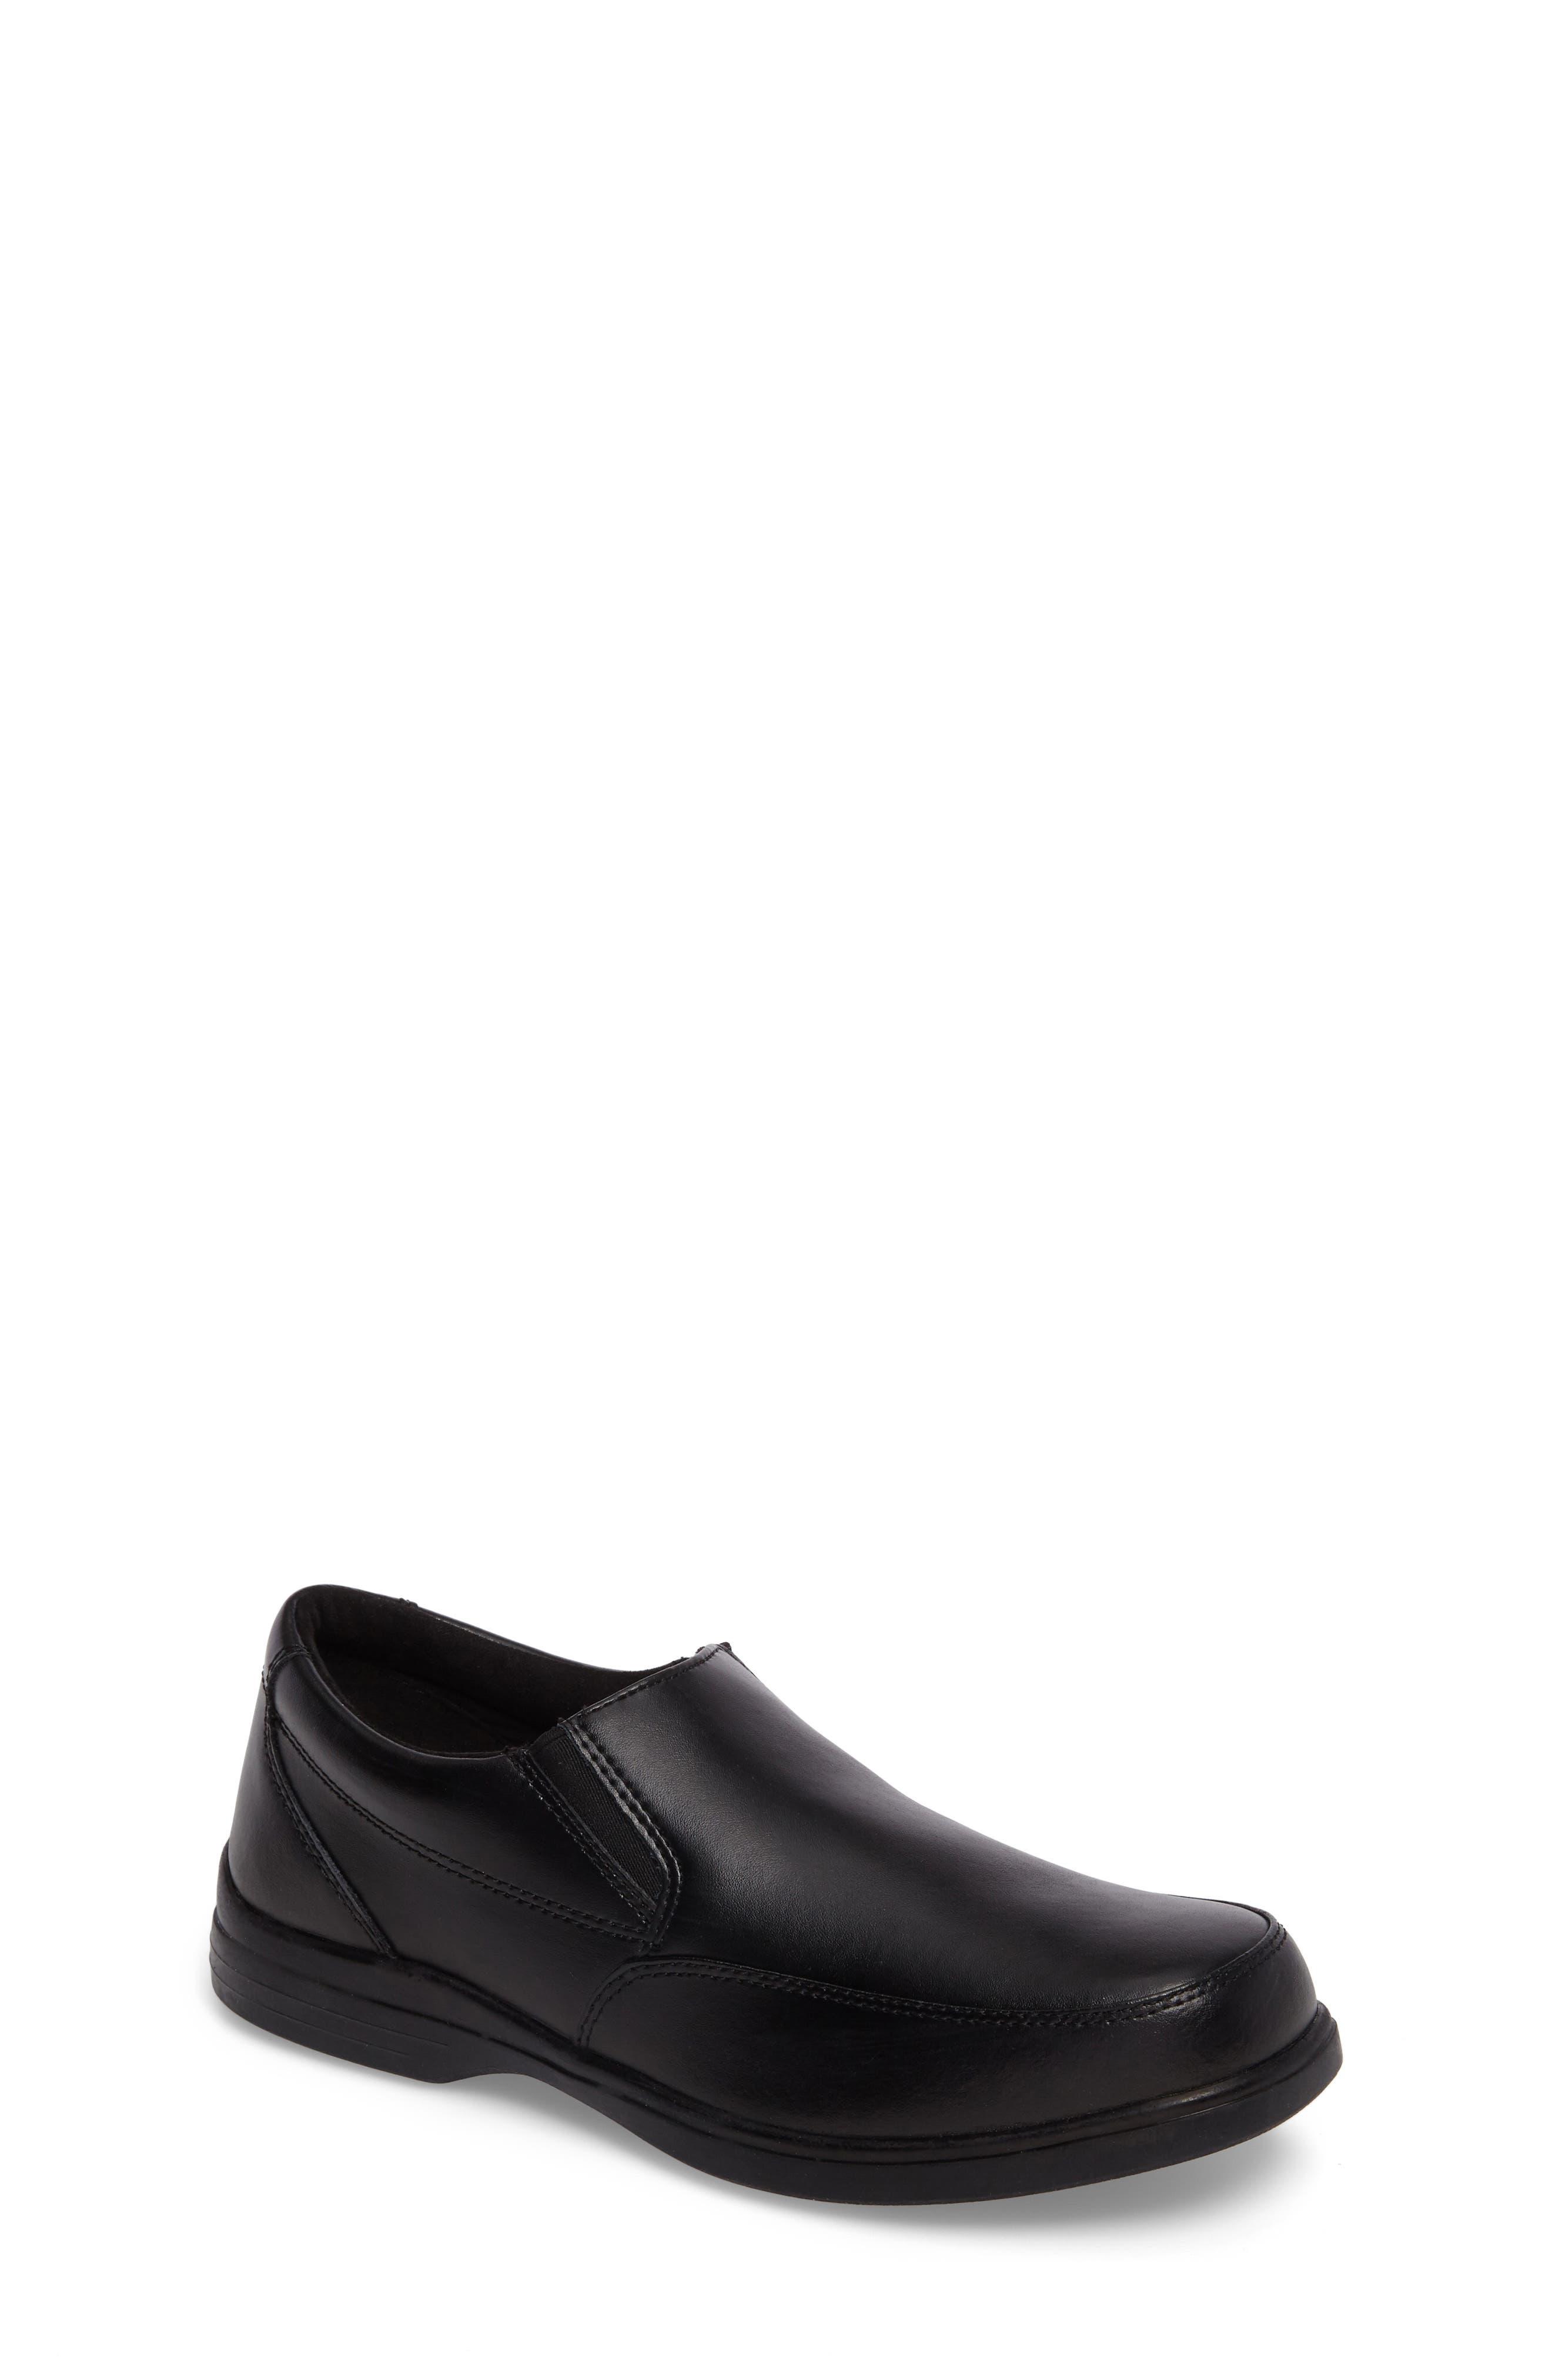 Shane Slip-On Dress Shoe,                         Main,                         color, 001